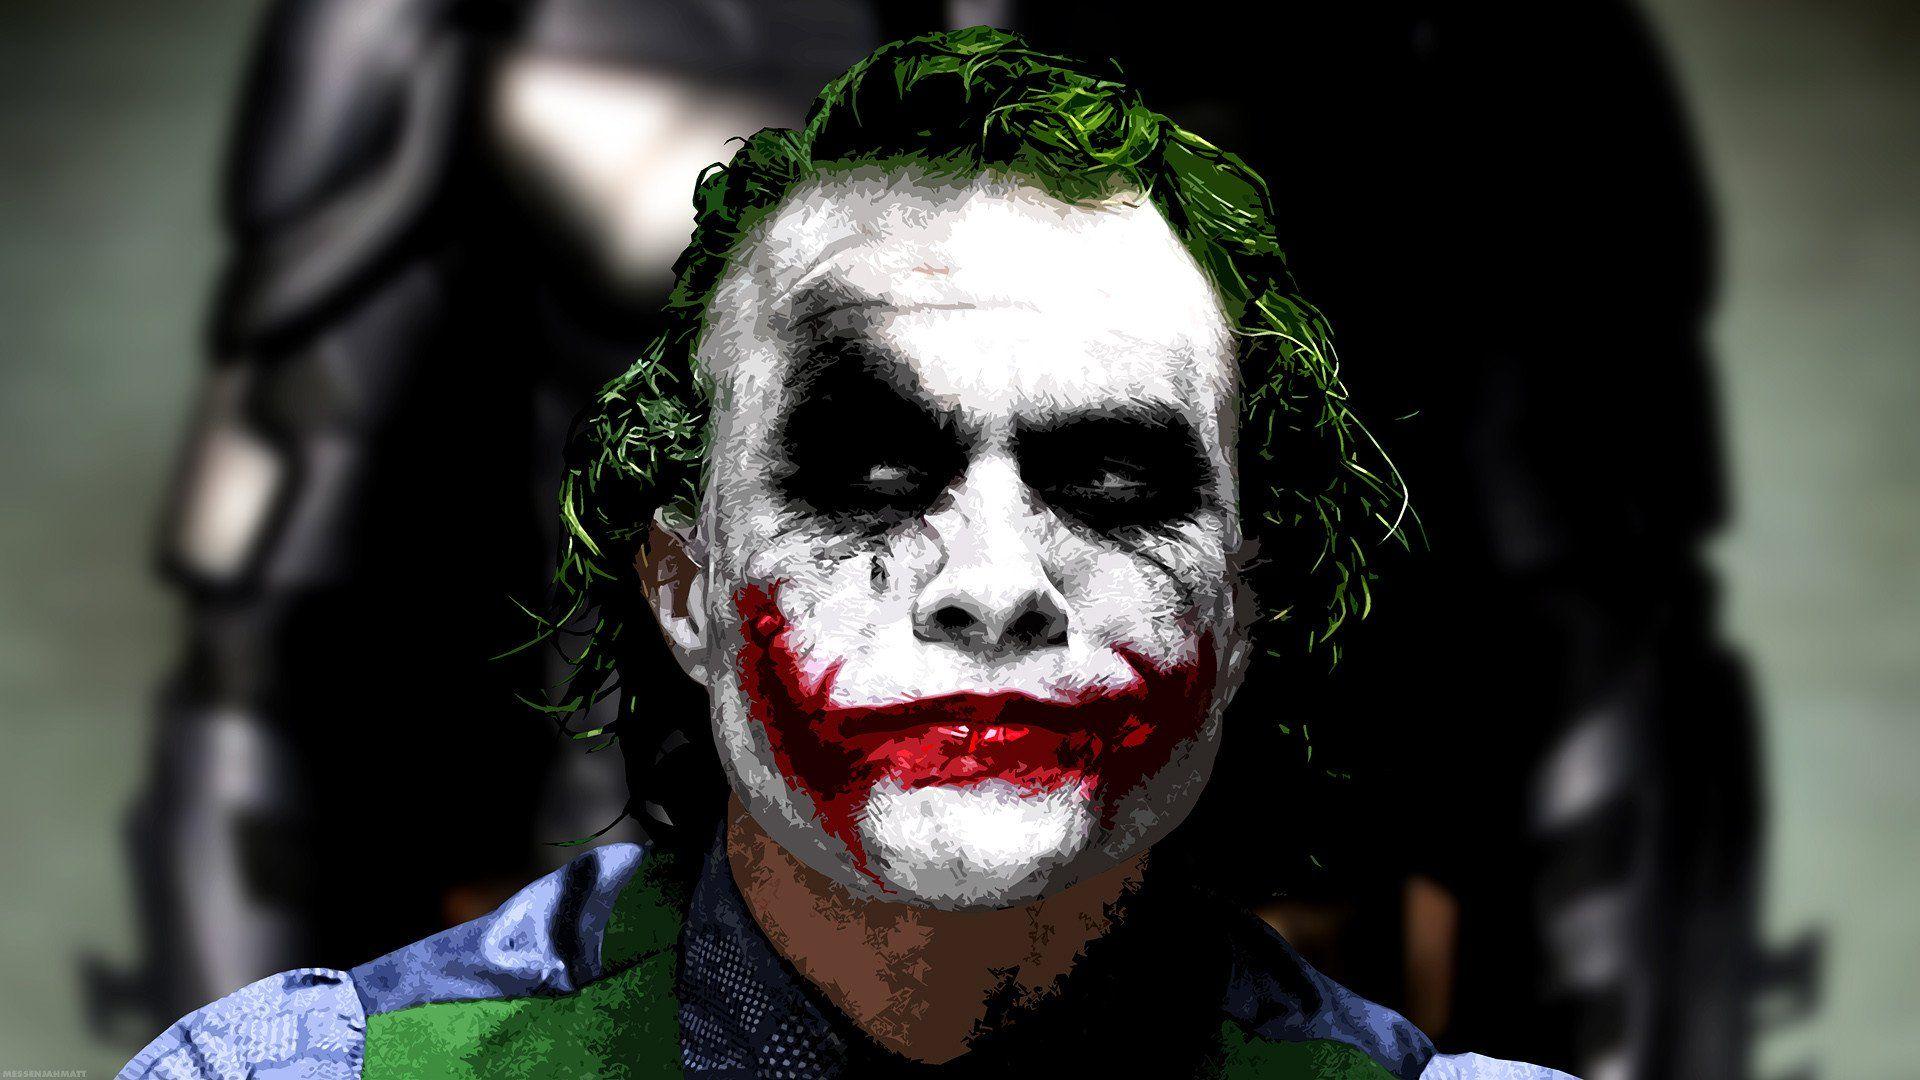 The Real Reason Why The Joker And The Batman Will Never Kill Each Other Wow Joker Dark Knight Dark Knight Wallpaper